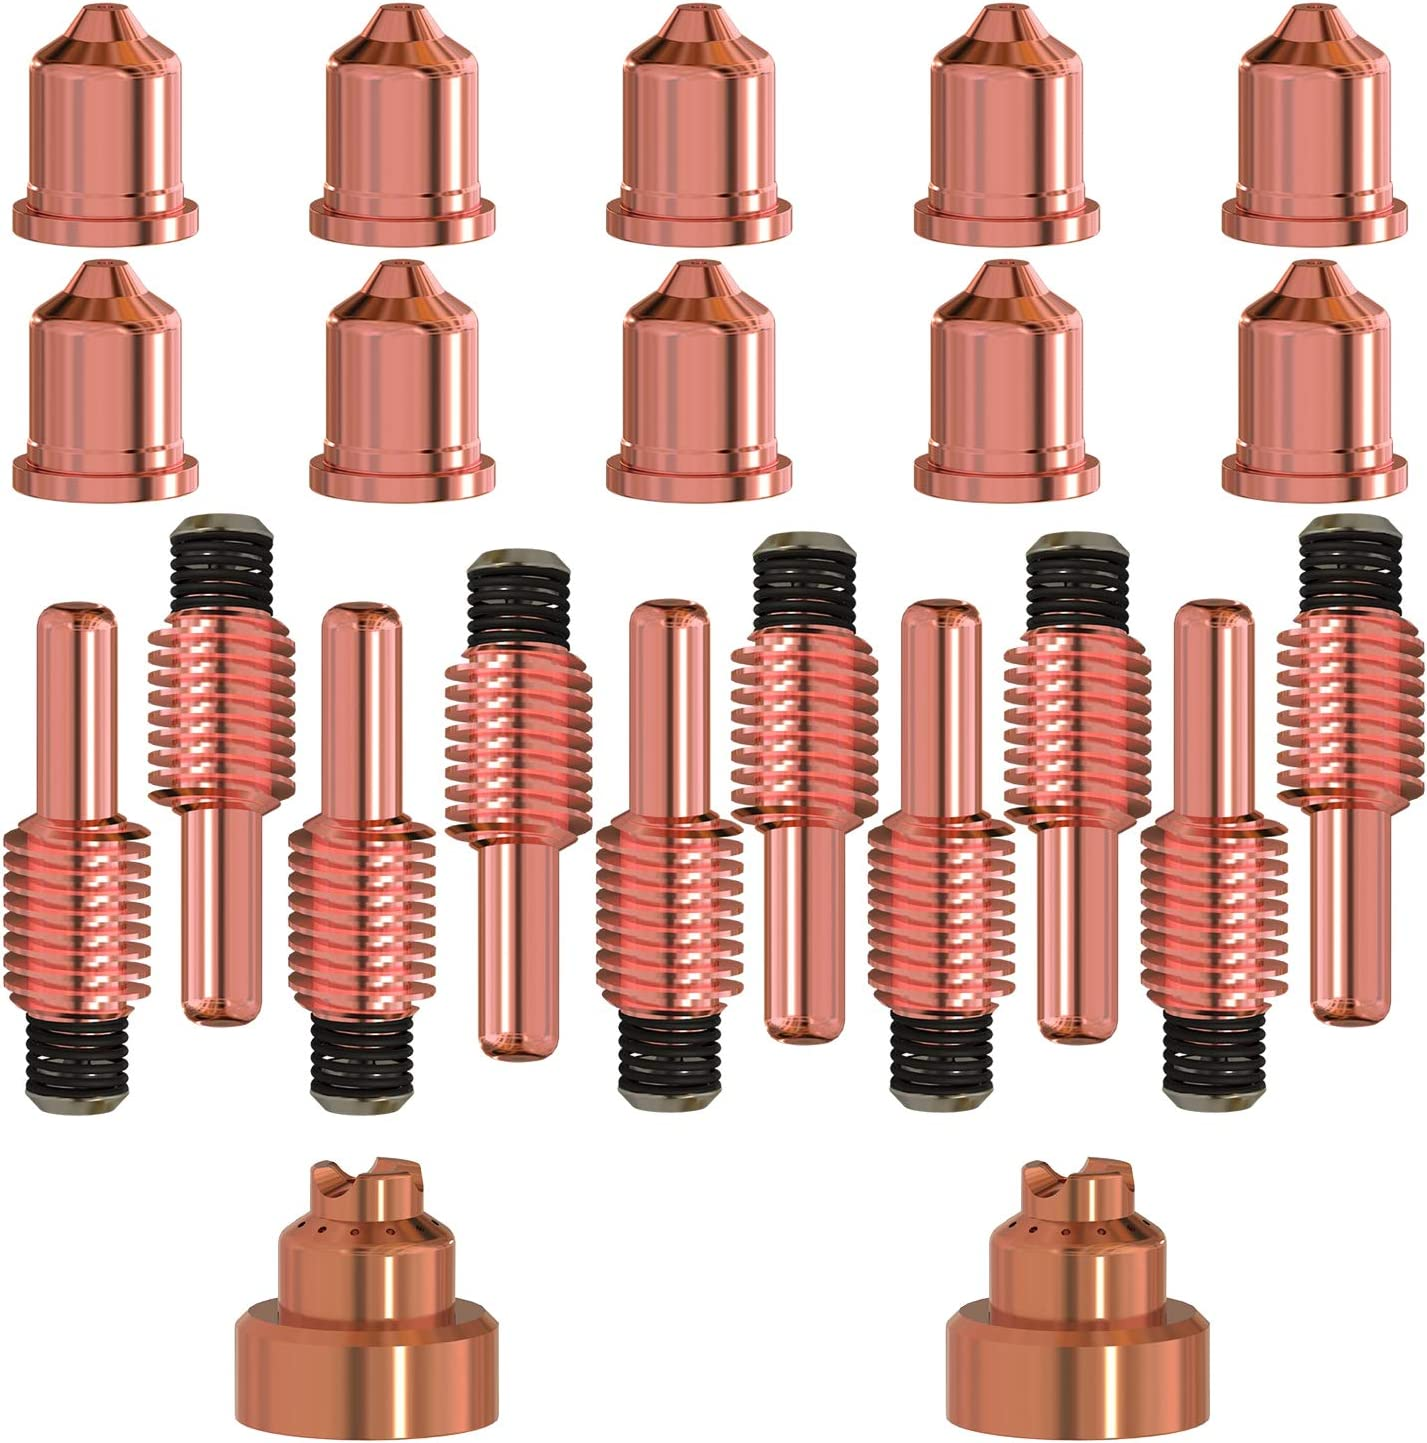 AIC 10PCS 220941 Plasma Electrodes 10PCS 220842 Plasma 2PCS 220818 Plasma Tips Fit Hypertherm Powermax 45//65//85//105